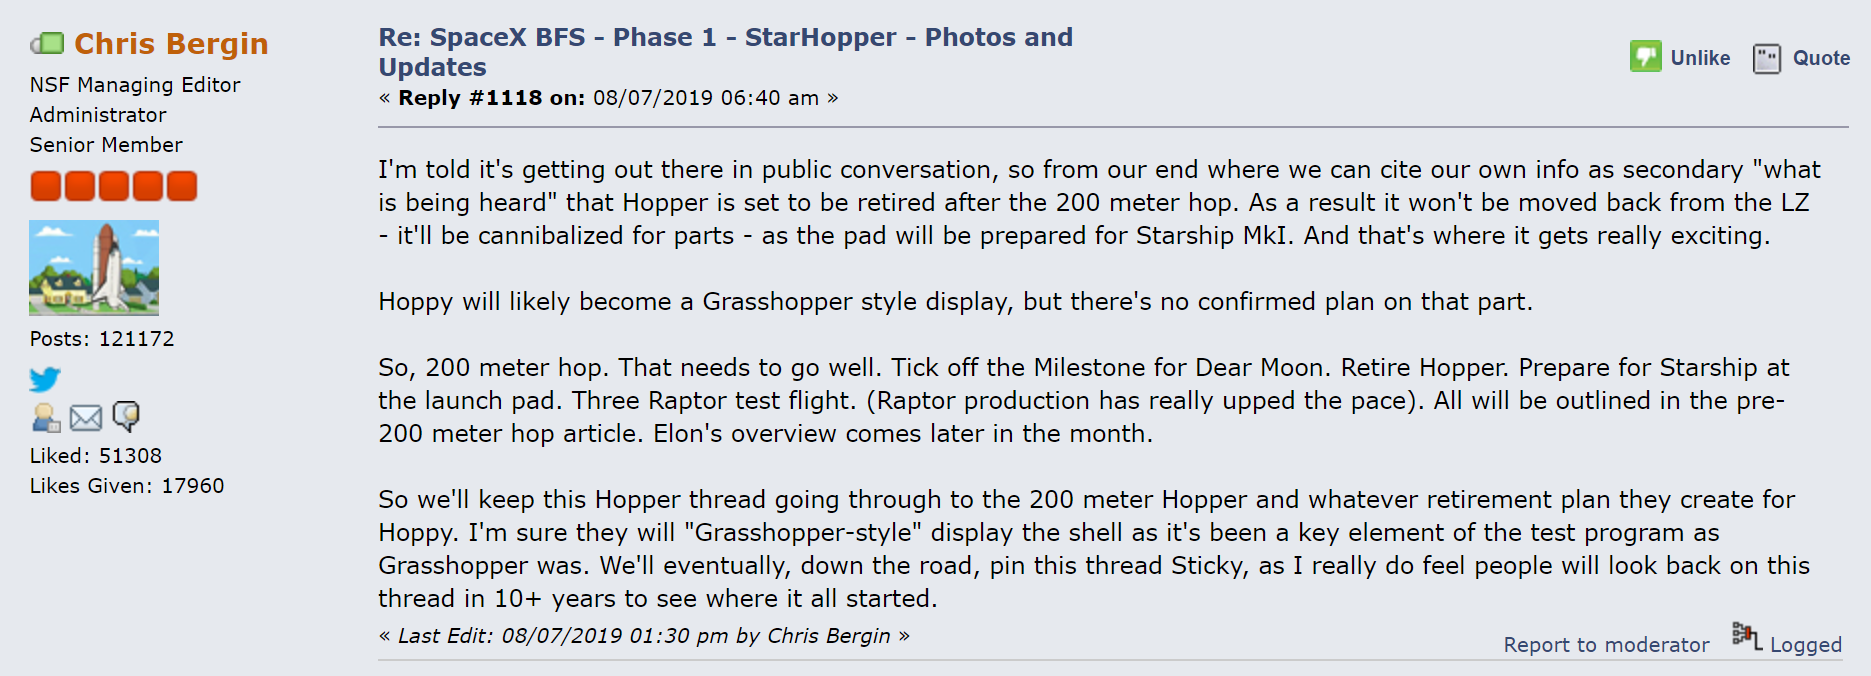 Chris Bergin Starhopper retiring 080719 (NASASpaceflight forums) 1